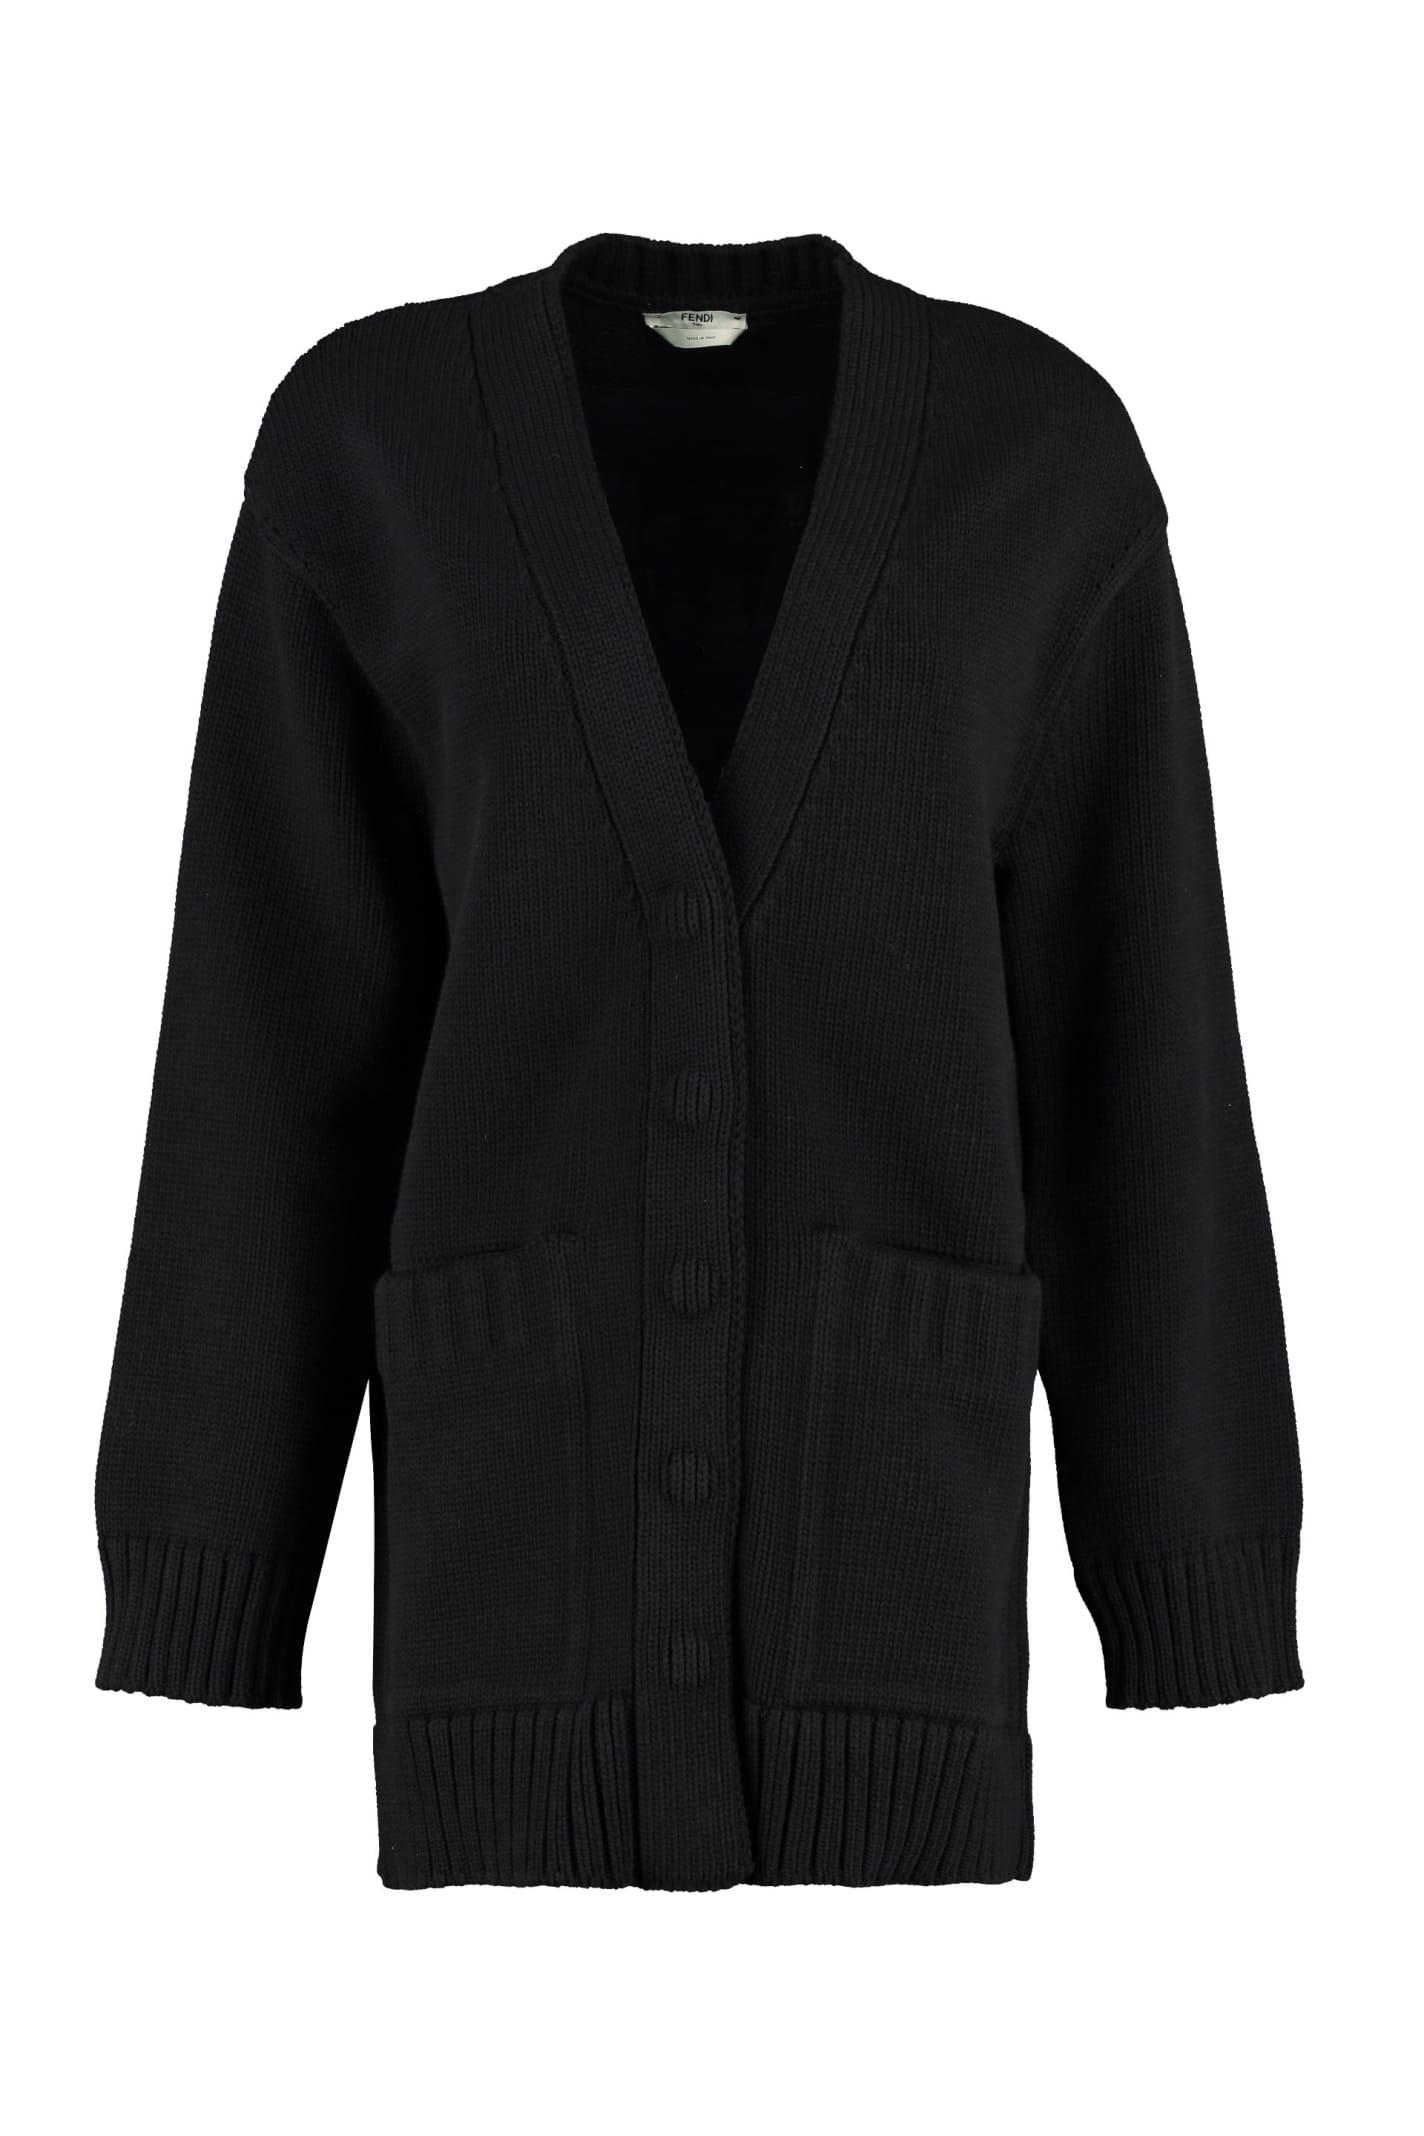 Fendi Knitted Cardigan